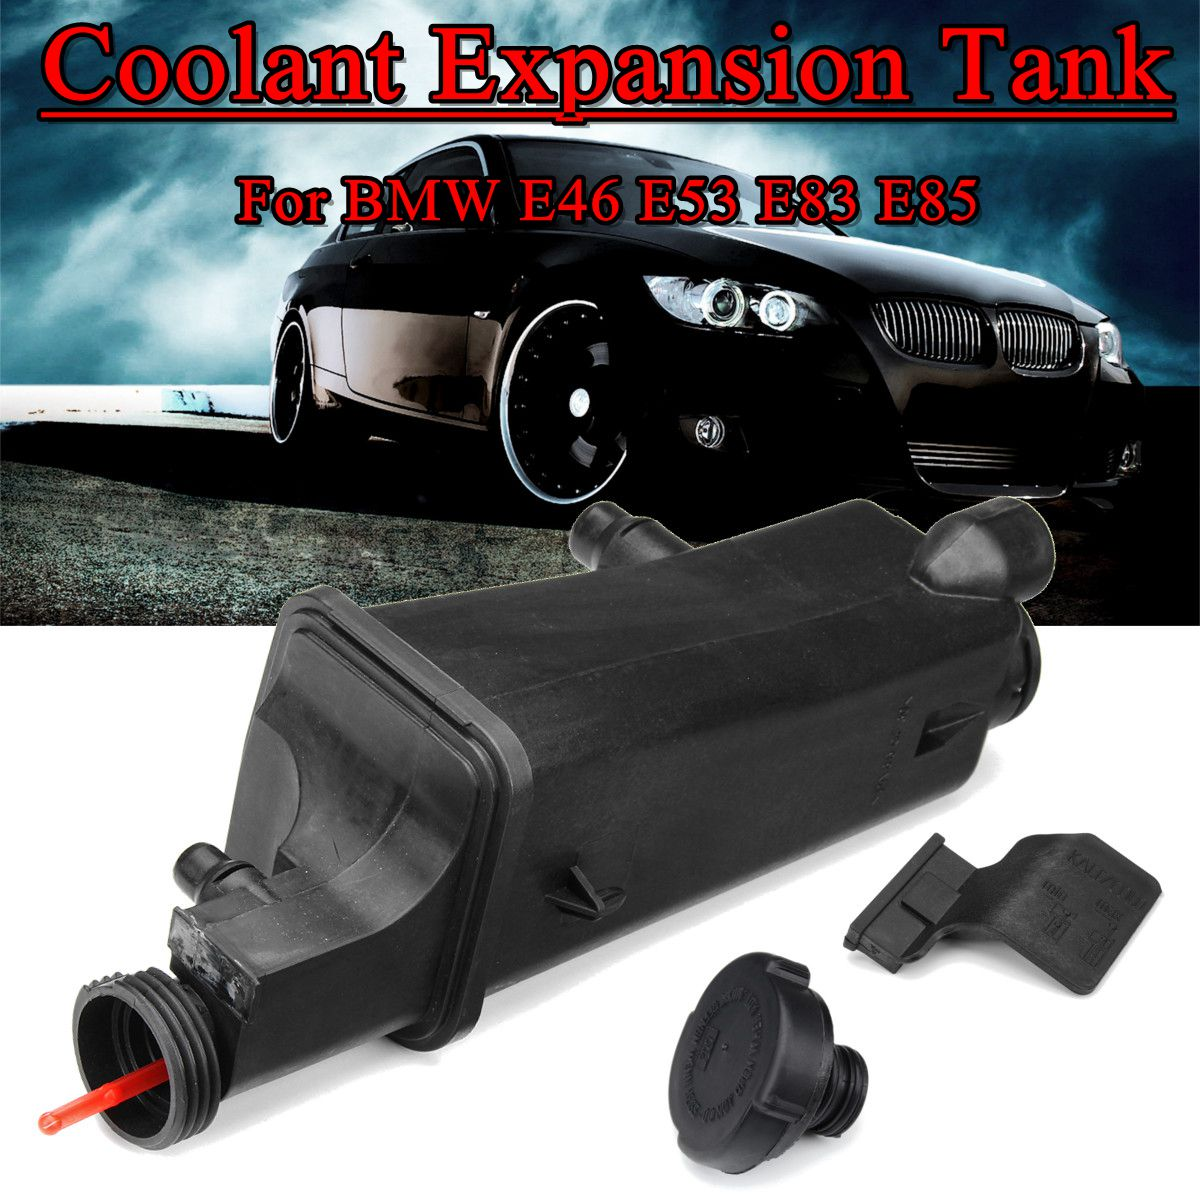 Sensor Clip FOR BMW E46 E53 E83 Coolant Reservoir Expansion Tank Cap